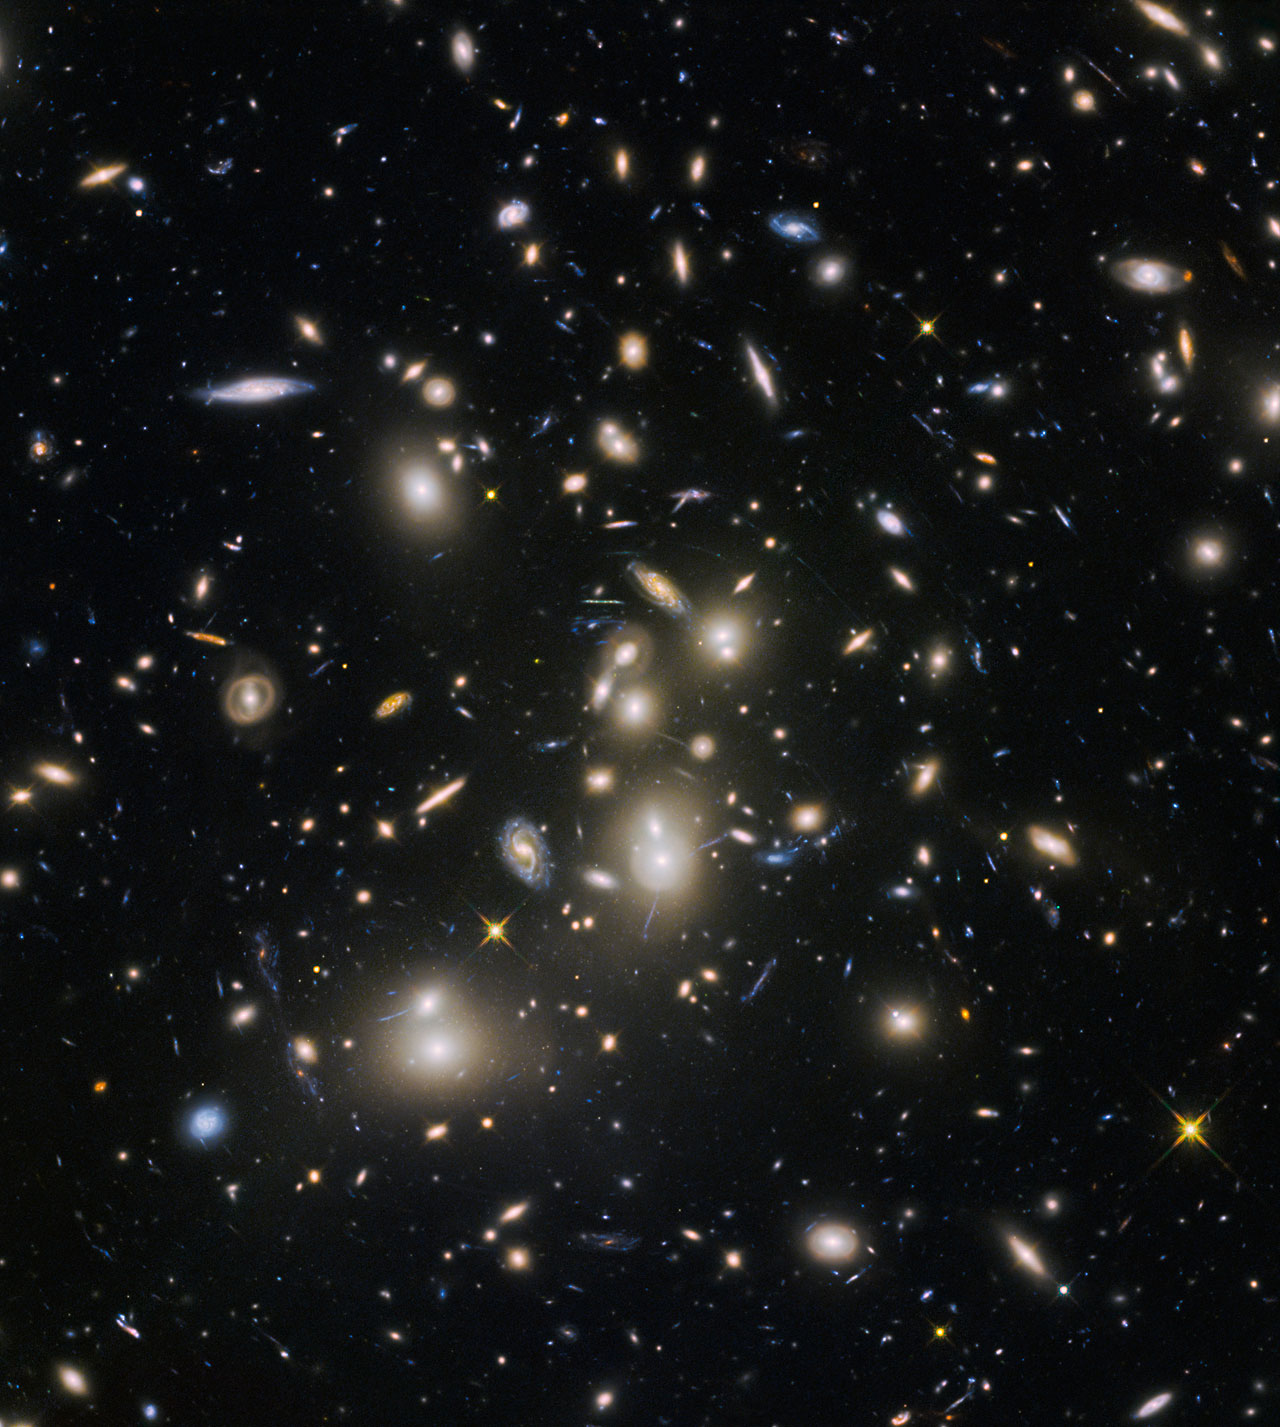 Hubble spies Big Bang frontiers | ESA/Hubble